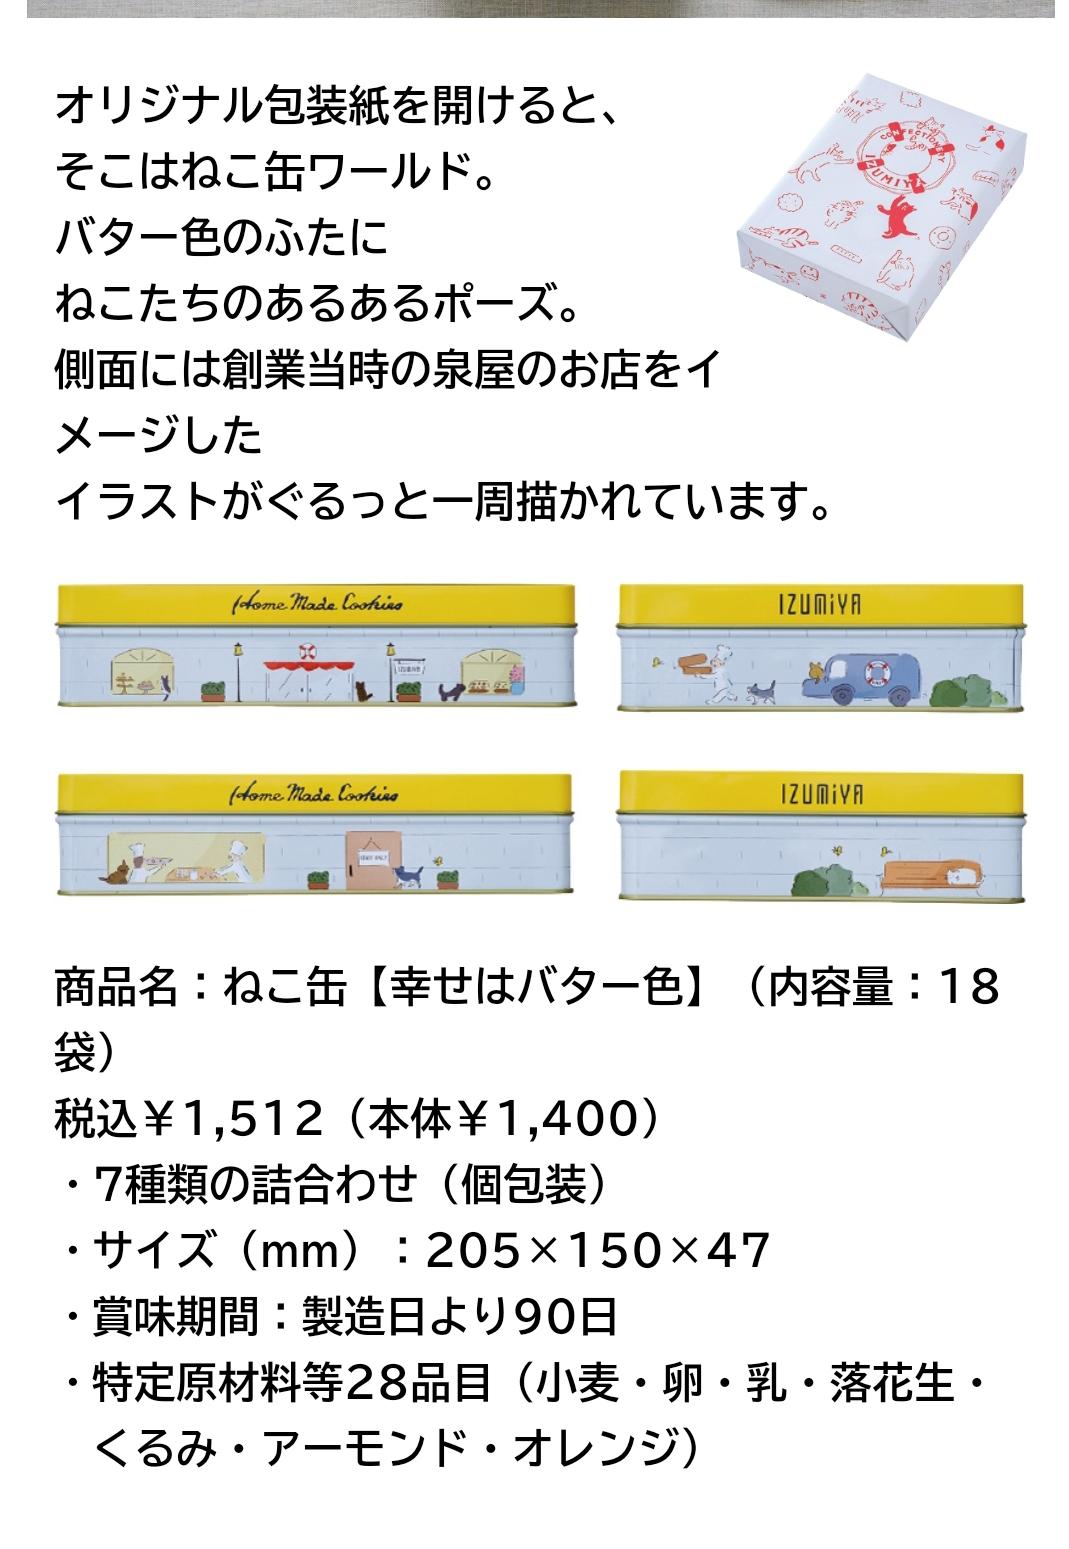 003685/5311a457.jpg